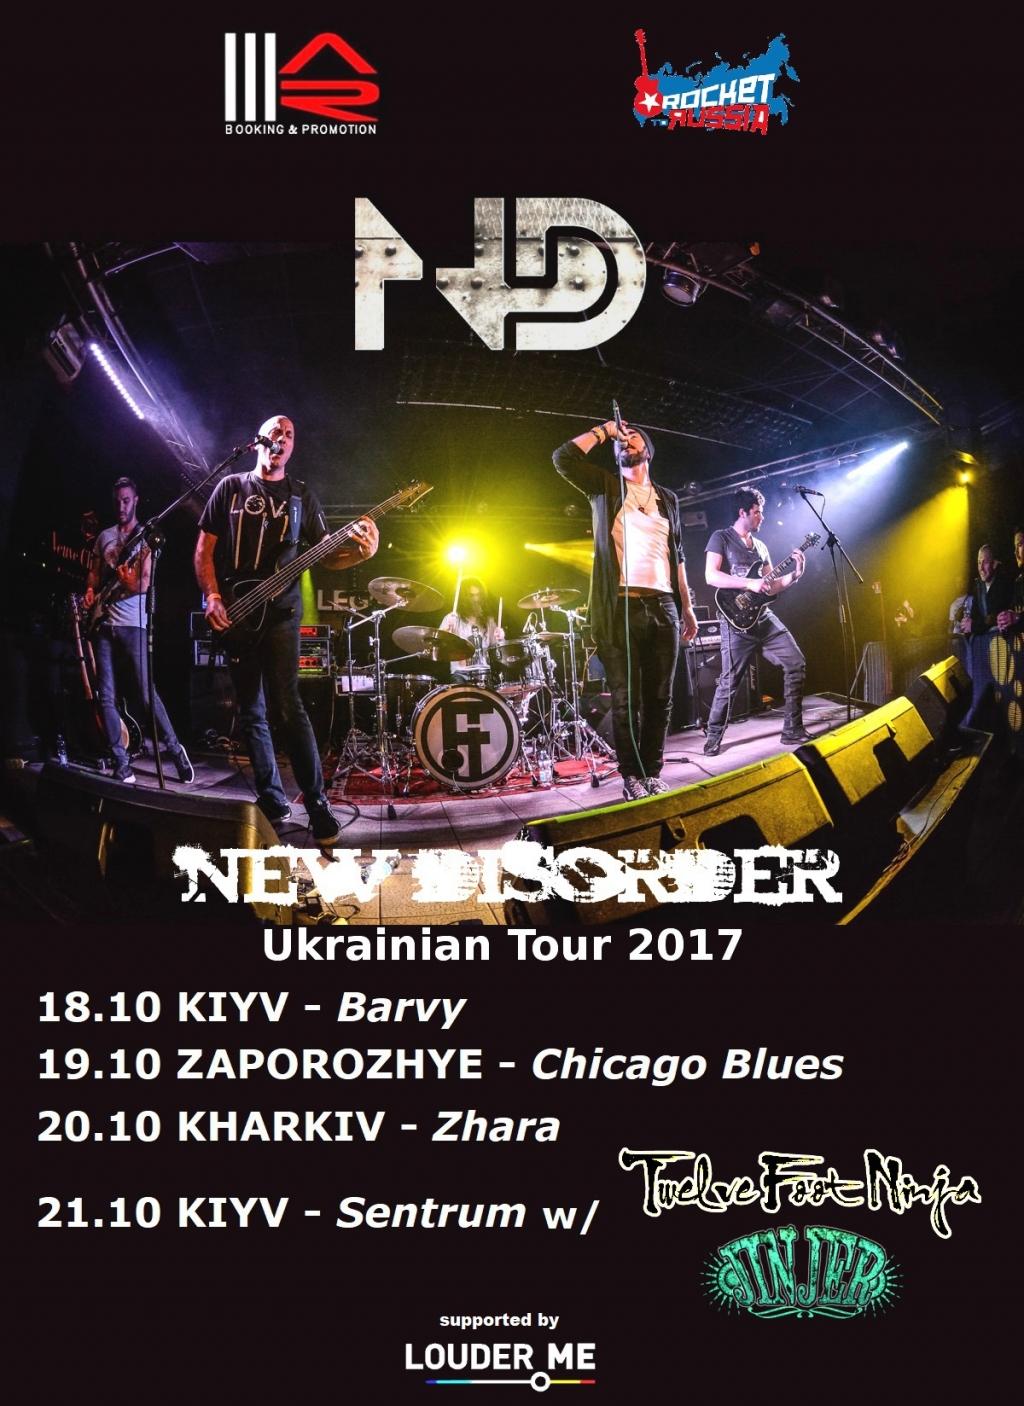 Trupa New Disorder lanseaza un nou videoclip si anunta turneul in Ucraina